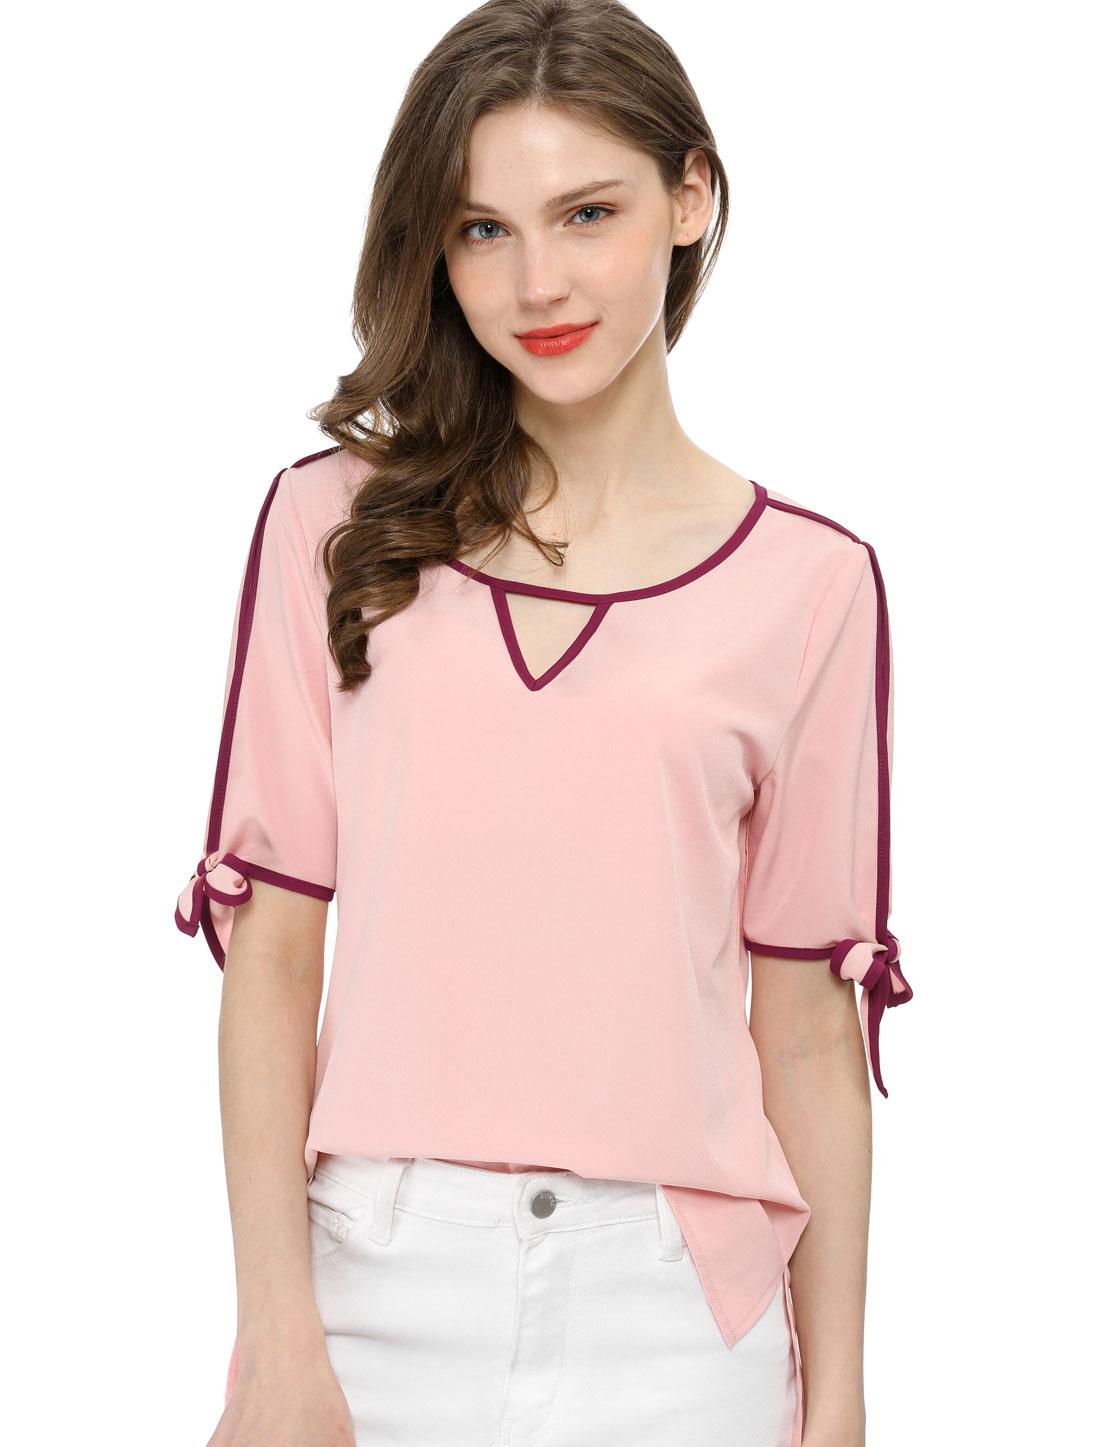 Allegra K Women V Cut-out Front Contrast Bow Tie Cuffs Top Pink XL